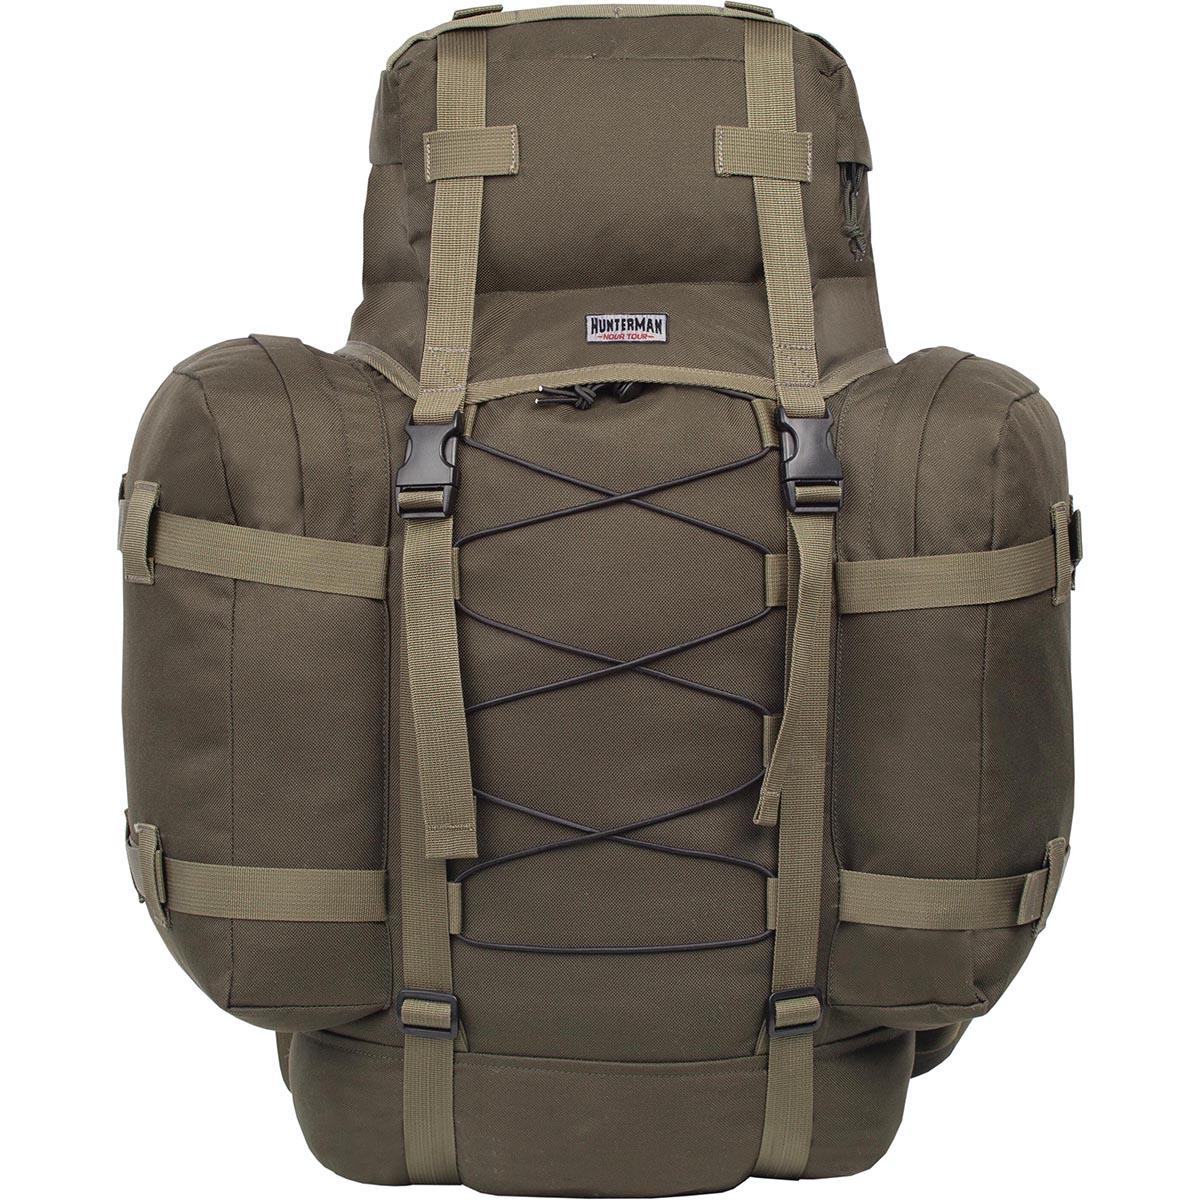 Рюкзак для охоты HunterMan Nova Tour  Контур 50 V3 , цвет: зеленый, 50 л - Охота